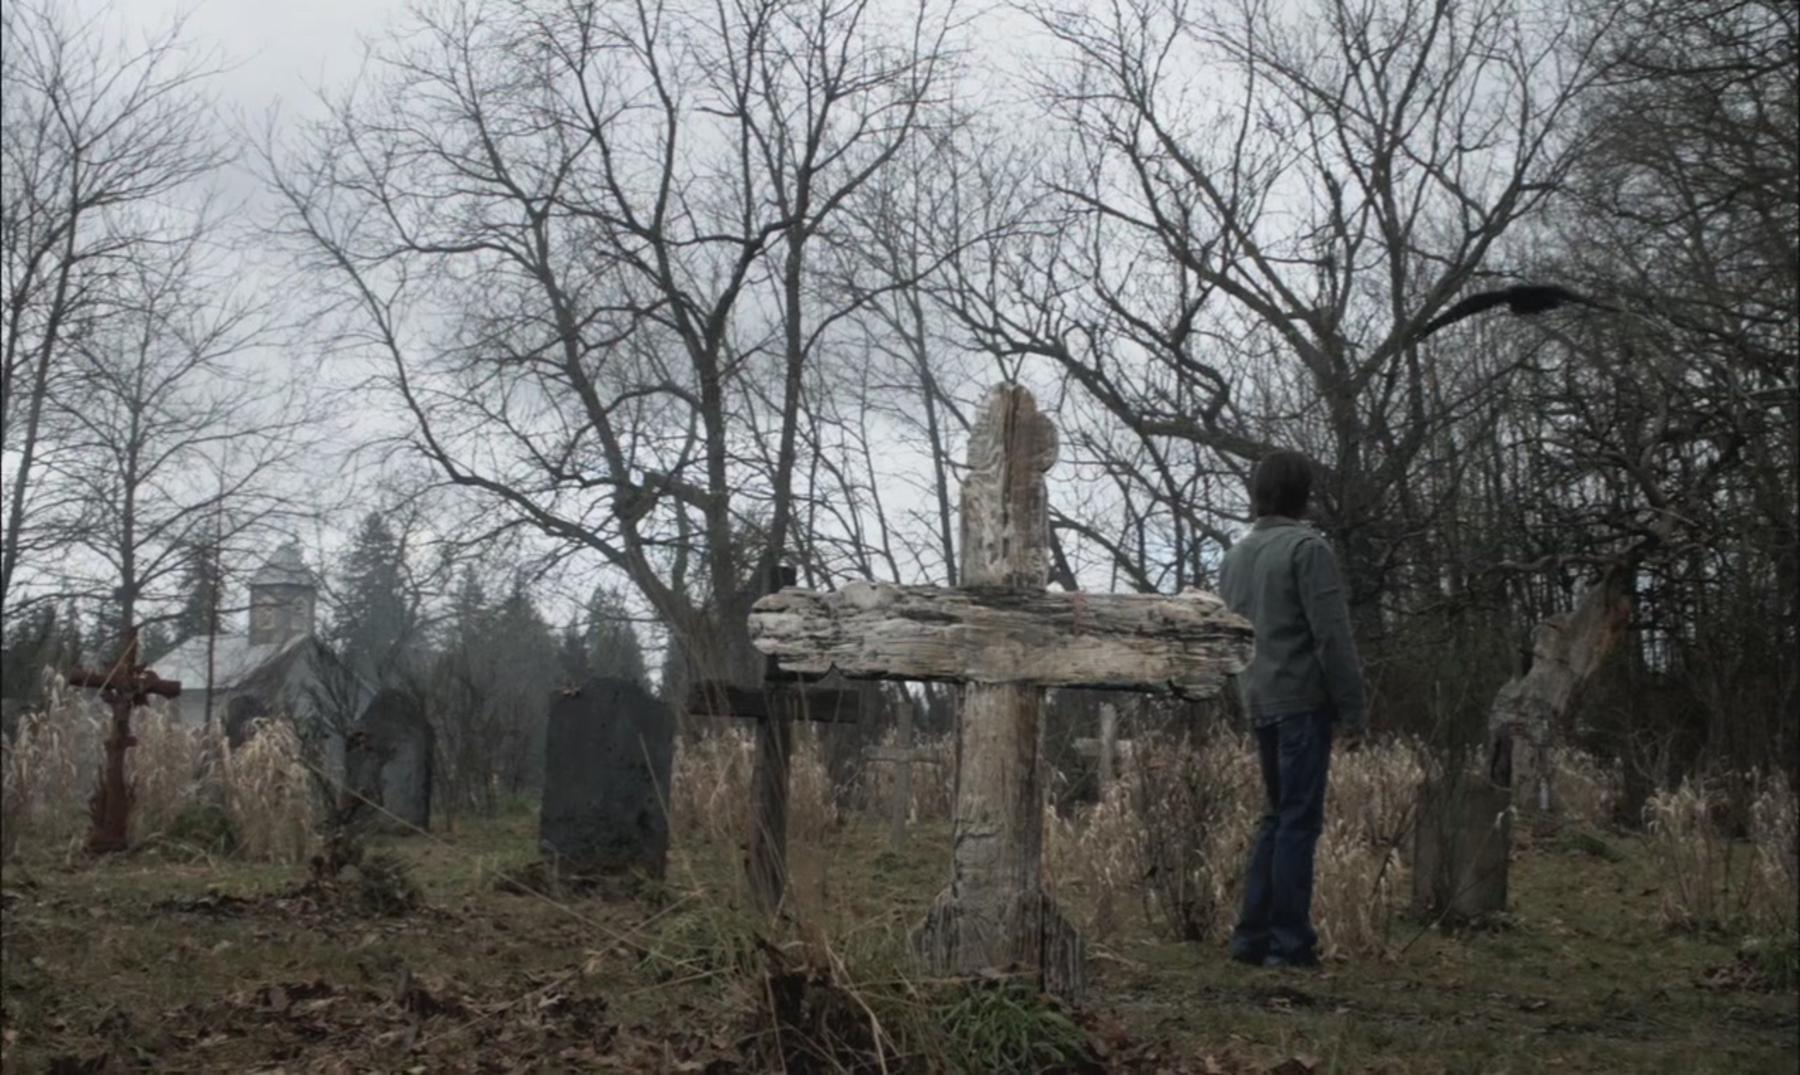 El cementerio de Stull, Kansas, un portal al Infierno